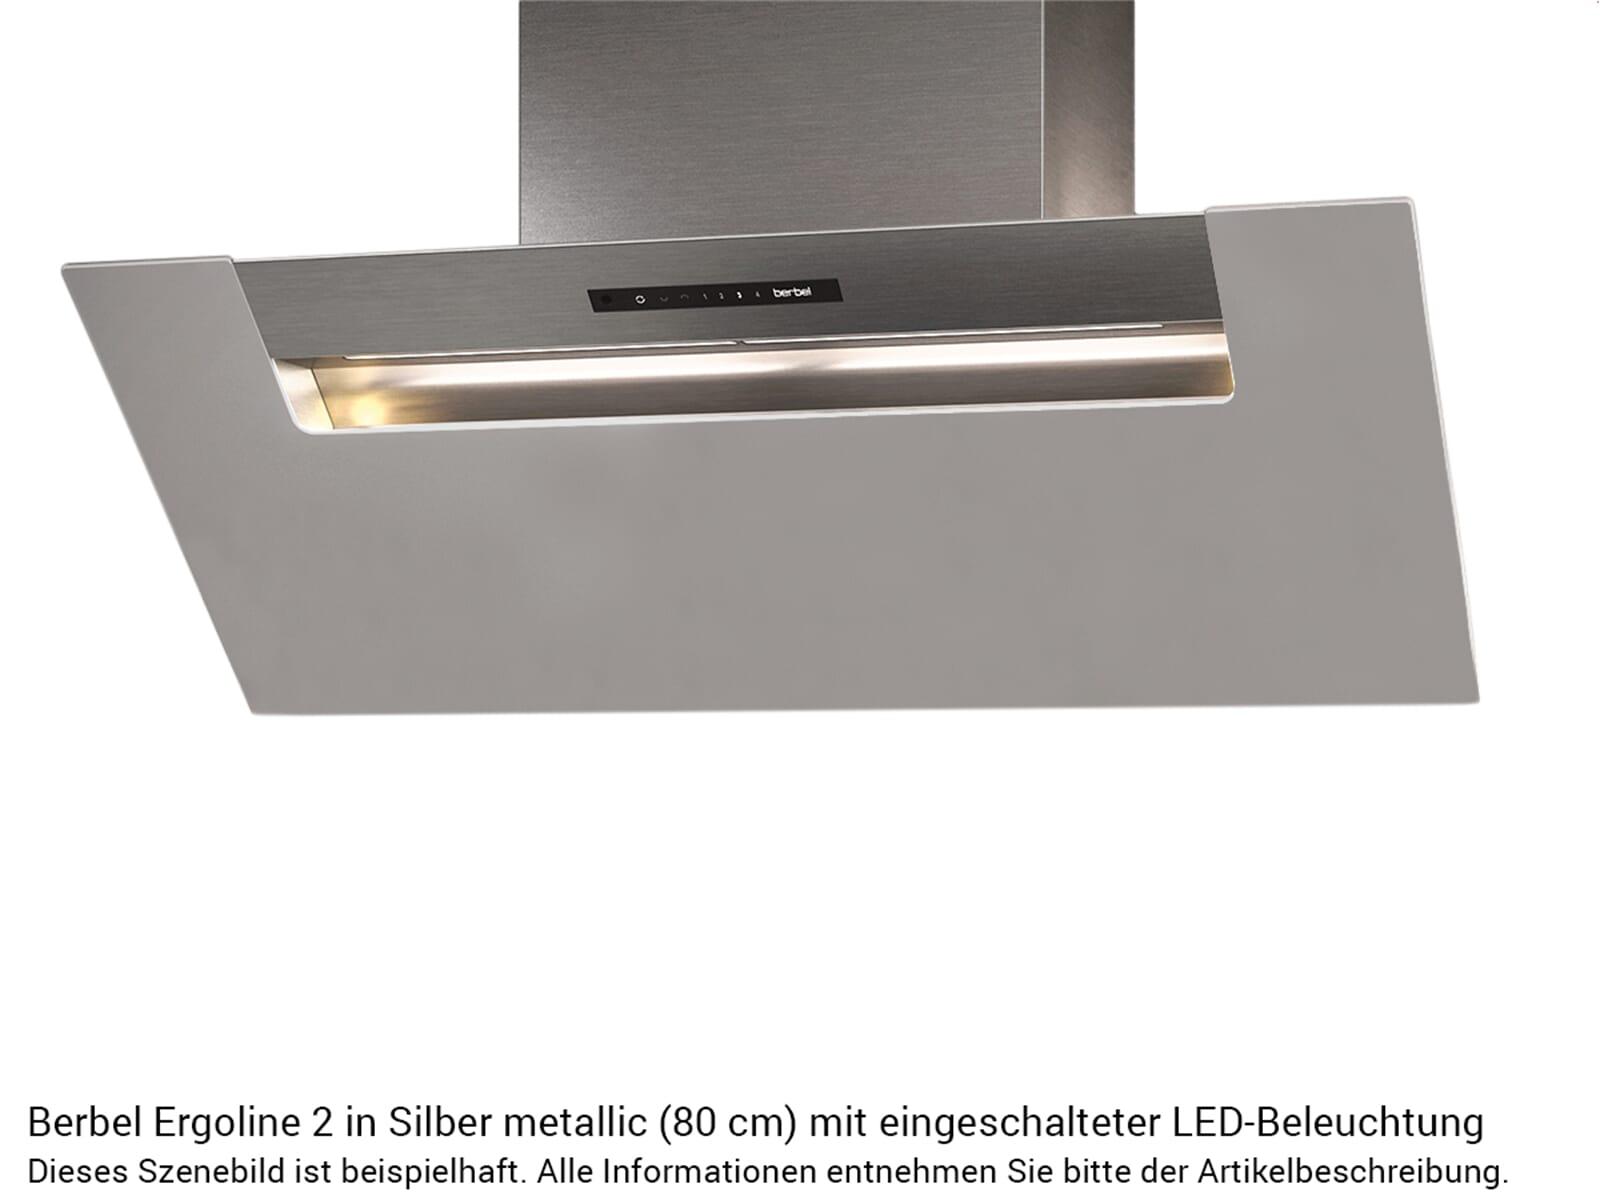 Berbel Ergoline 2 BKH 120 EG 2 Kopffreihaube Silber metallic